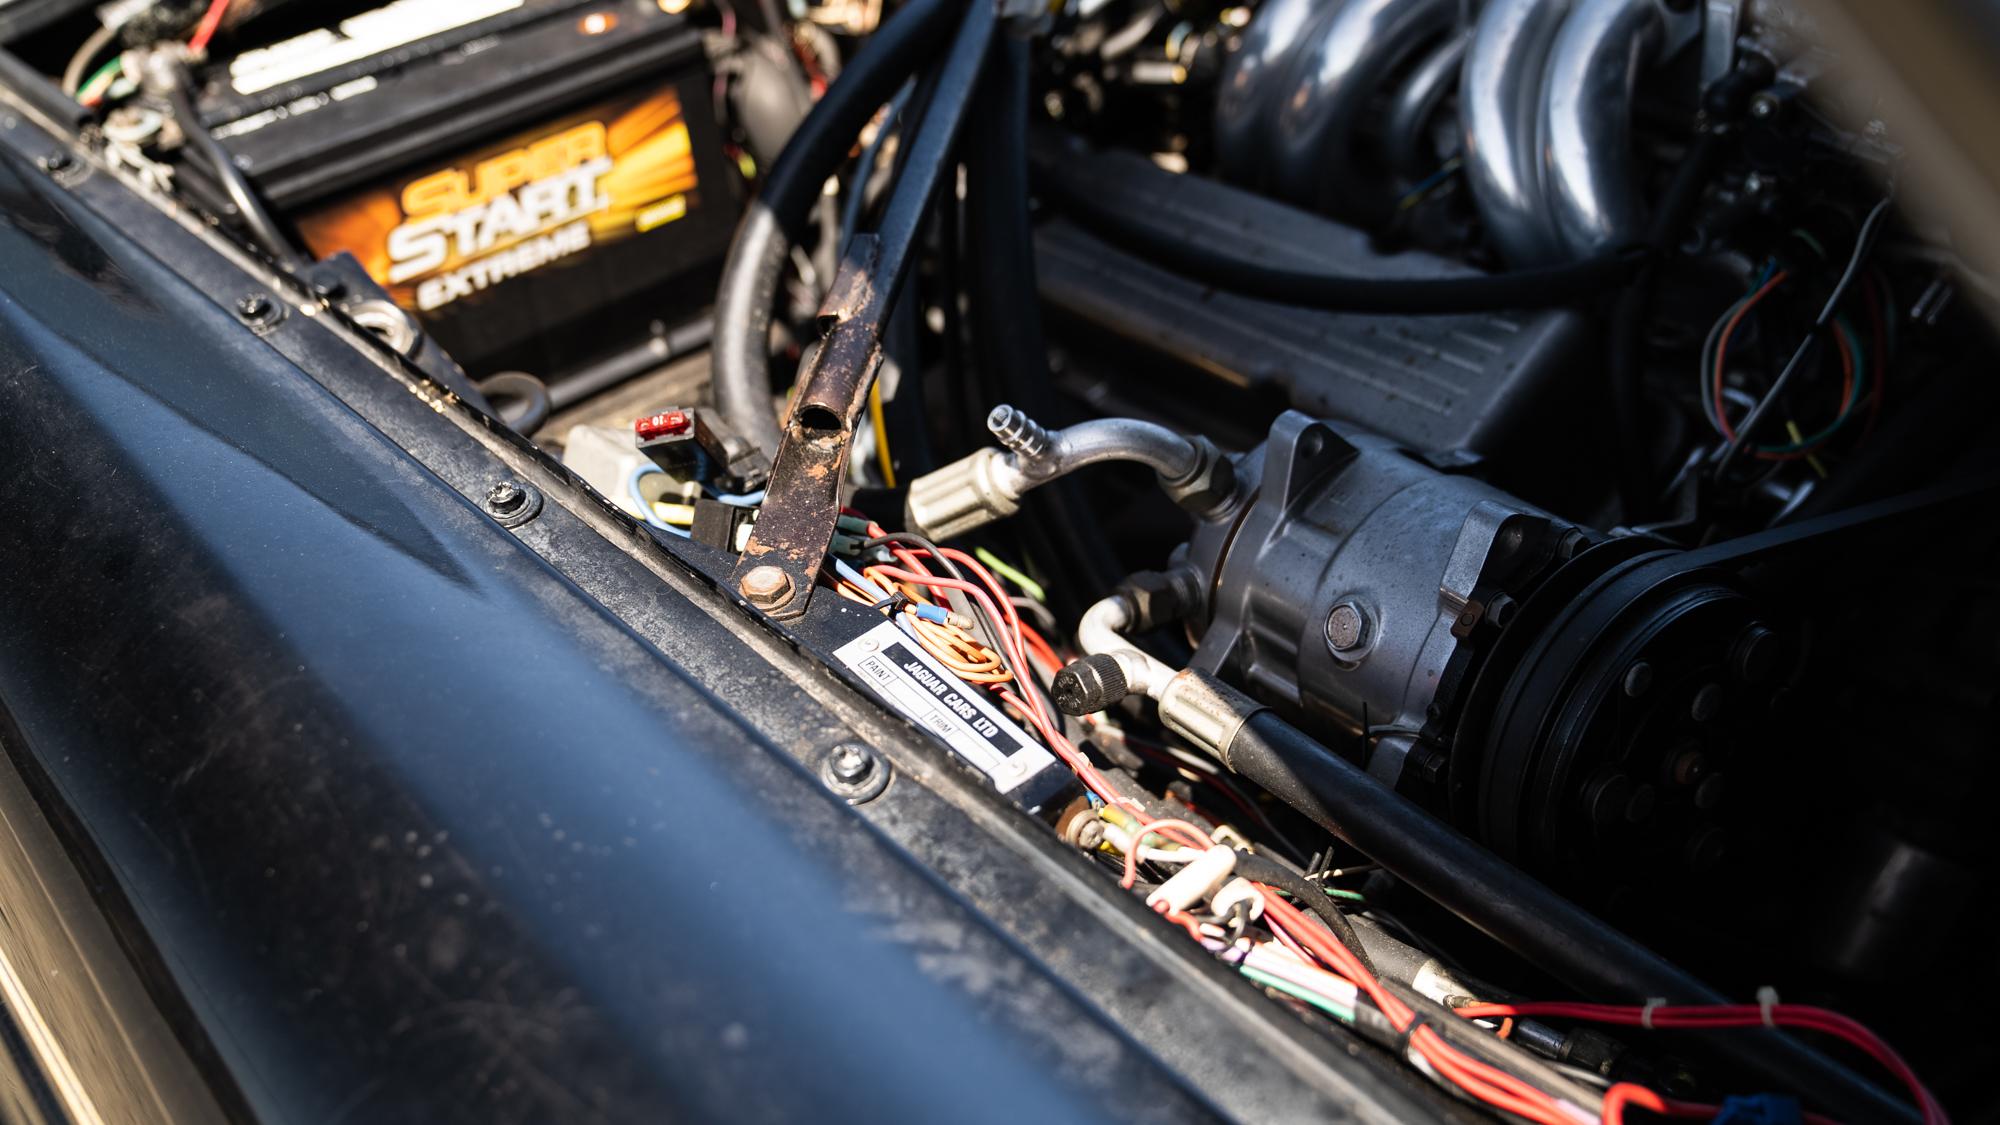 1986 Jaguar XJ6 engine bay